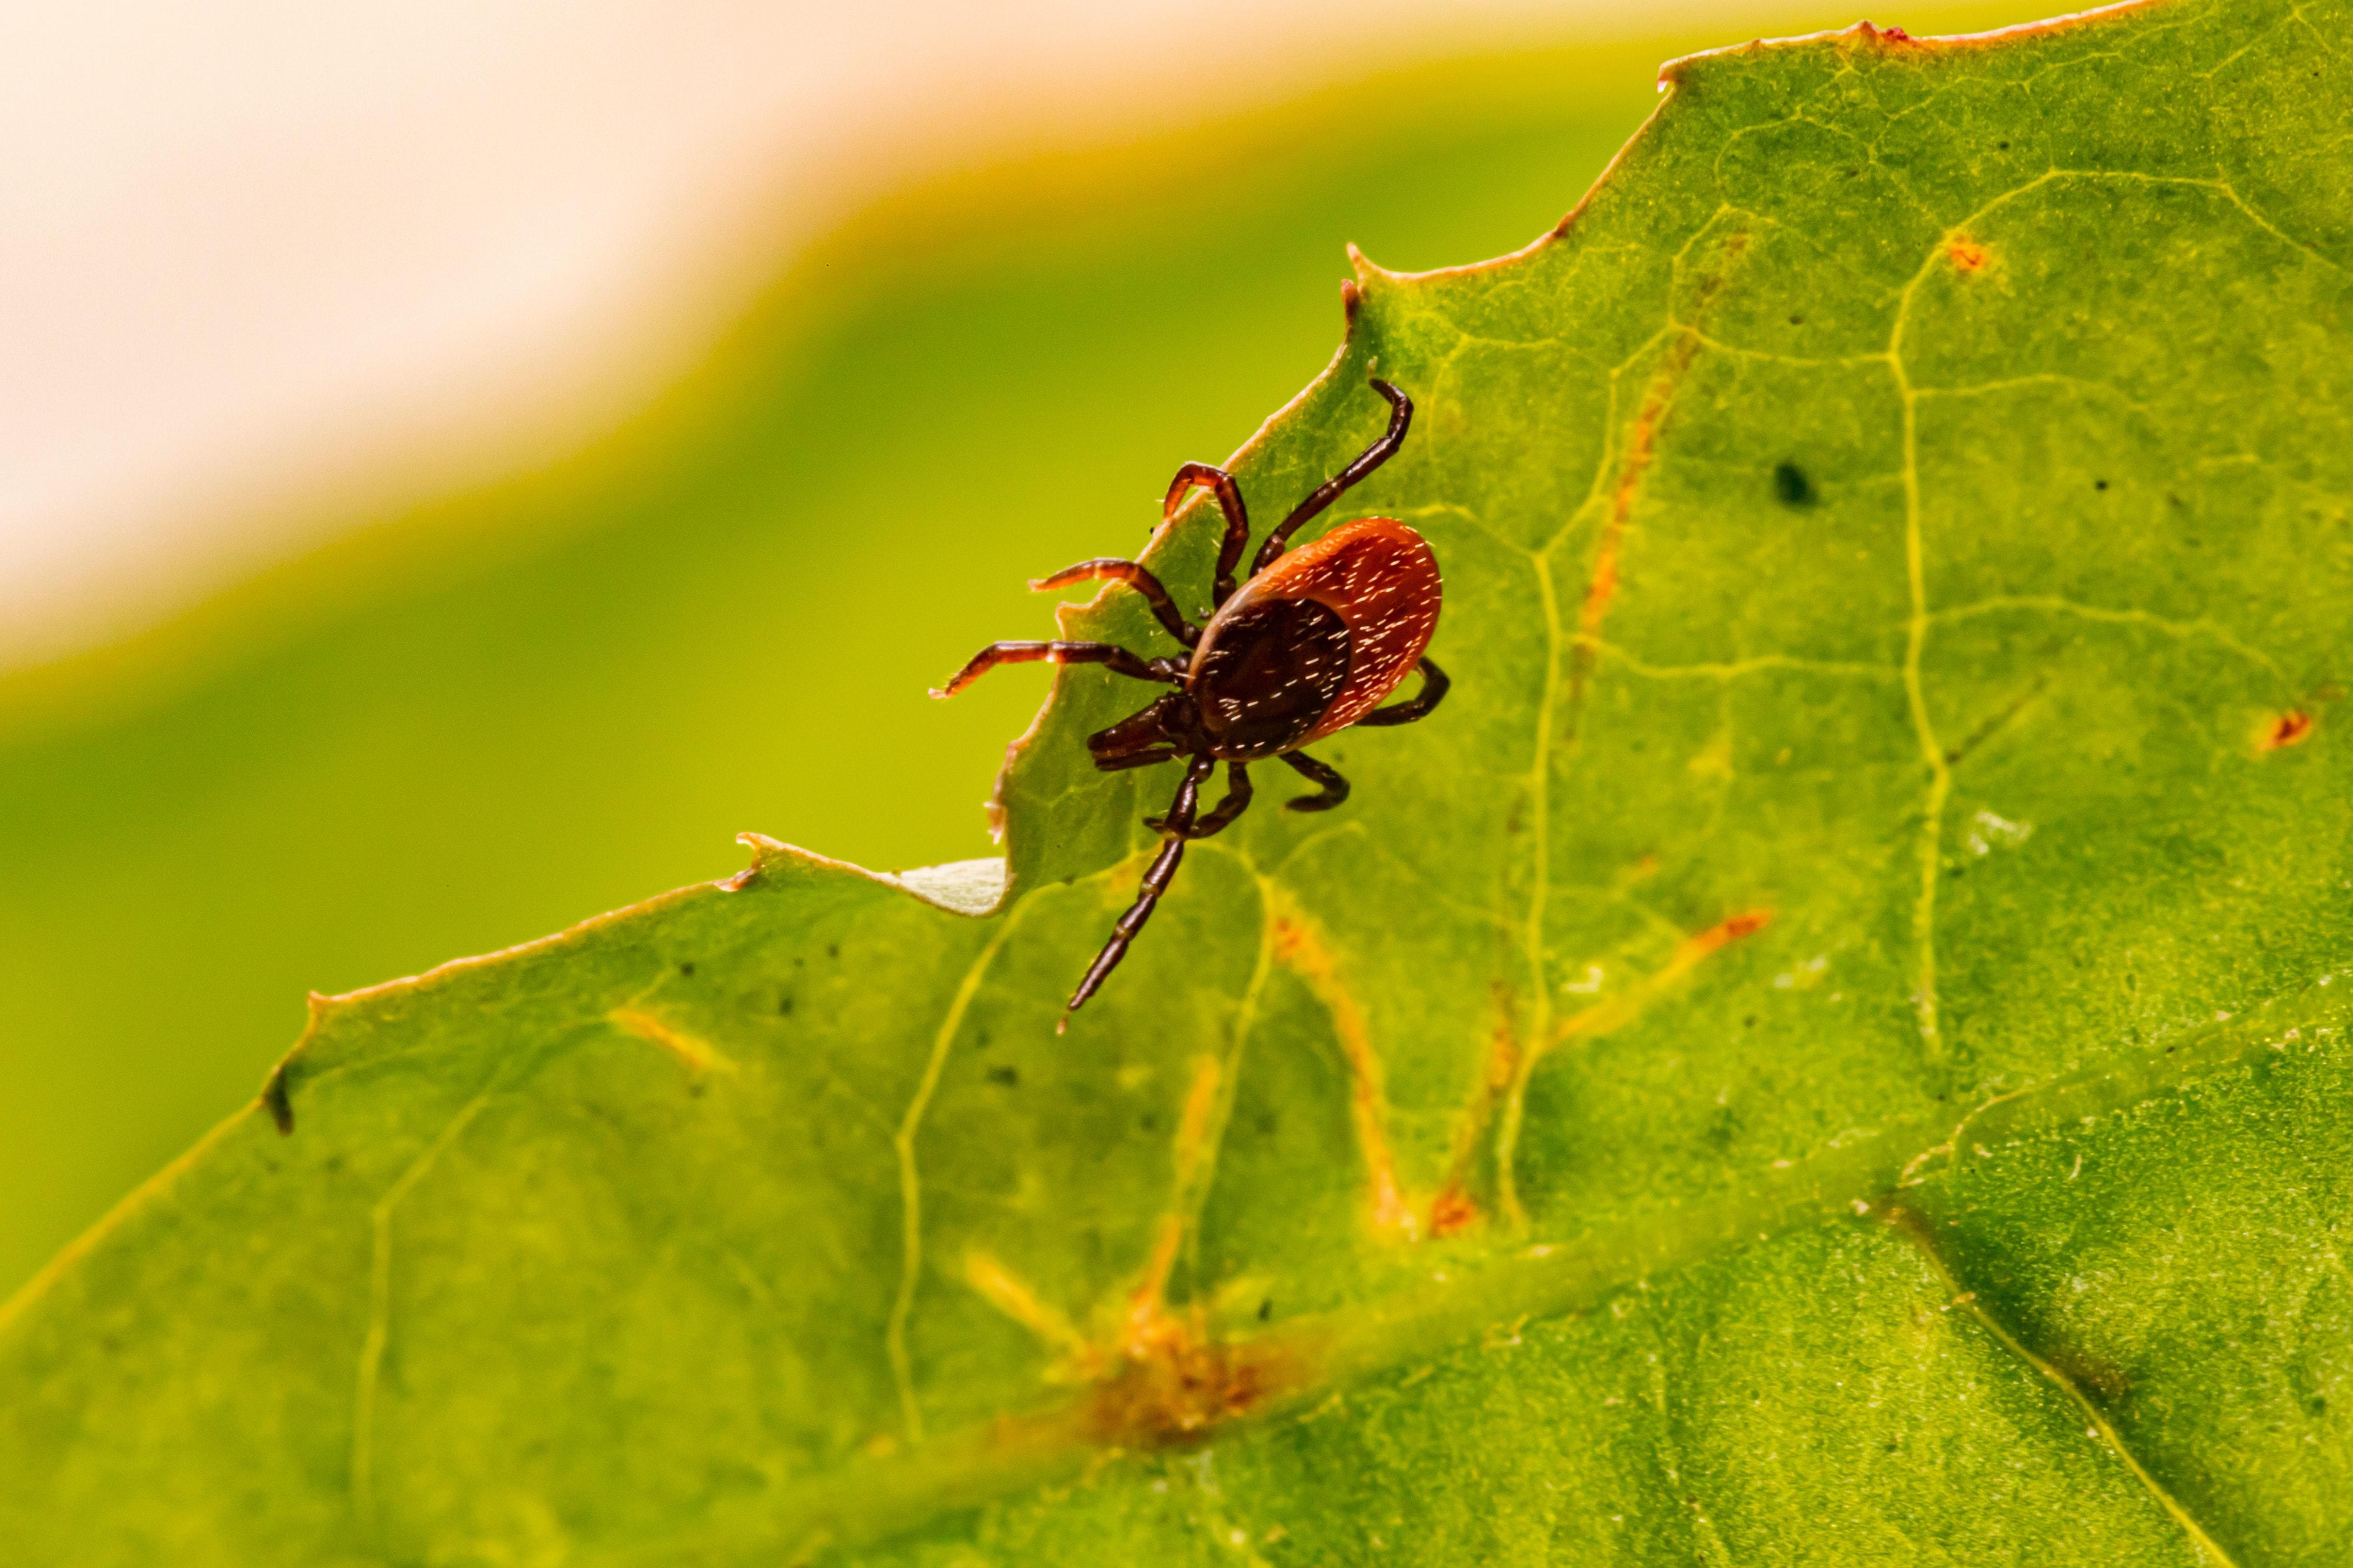 Avoiding Diseases Carried by Ticks